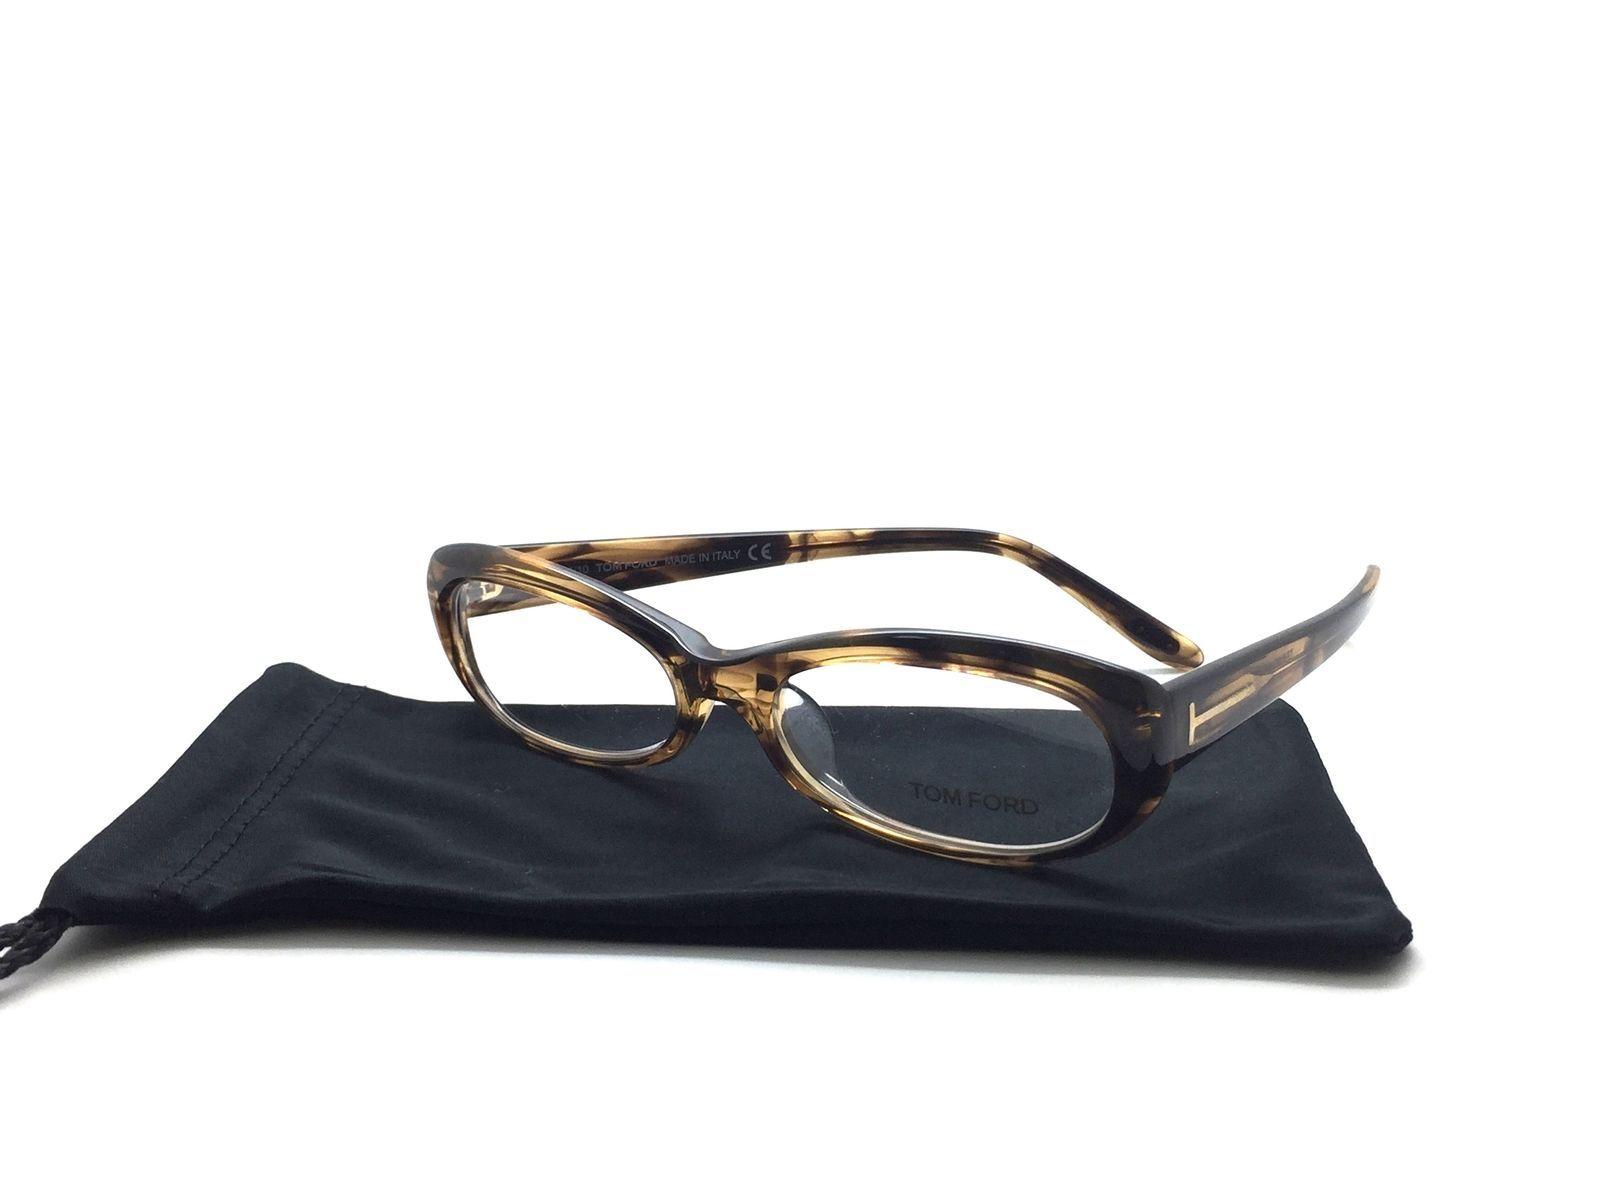 bcef71da53c8 TOM FORD Ladies narrow eyeglasses Honey and 50 similar items. S l1600